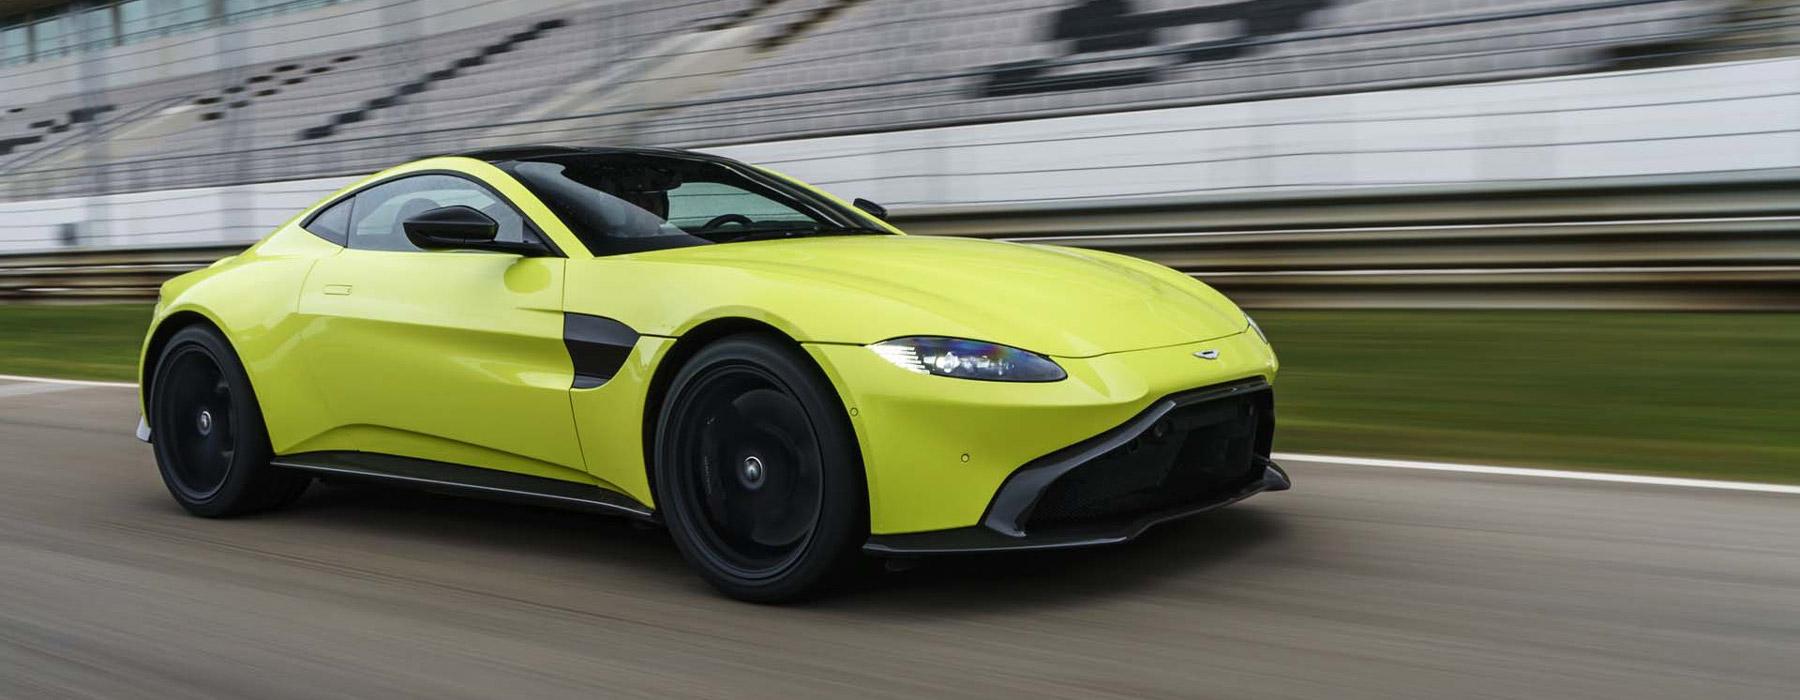 Drive an Aston Martin Vantage